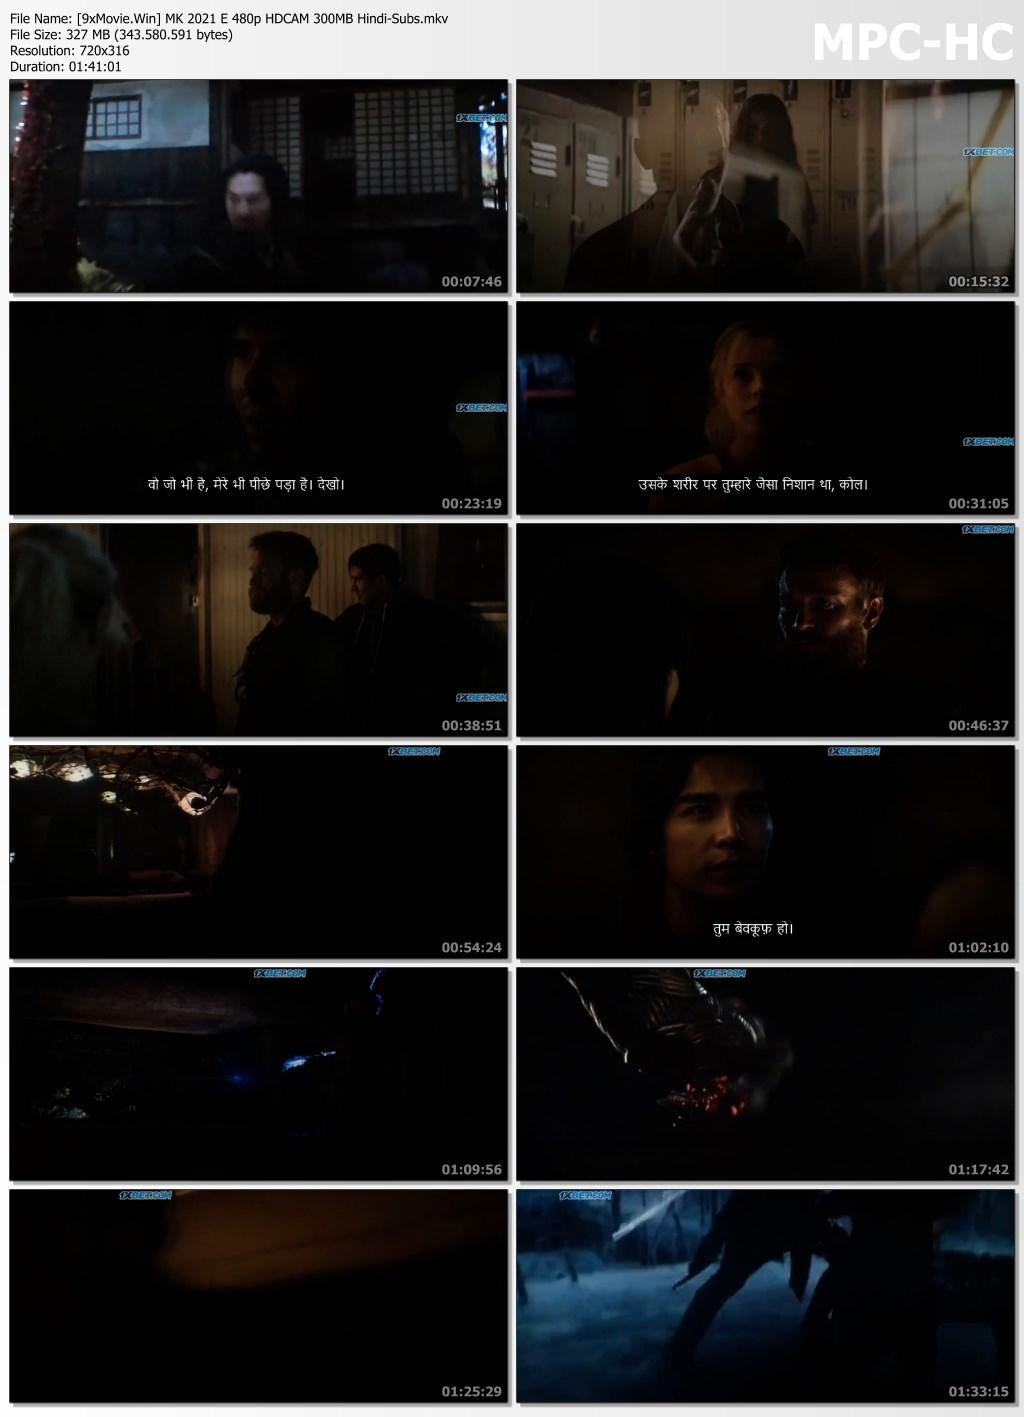 Mortal Kombat 2021 English 480p HDCAM x264 300MB Hindi-Subs